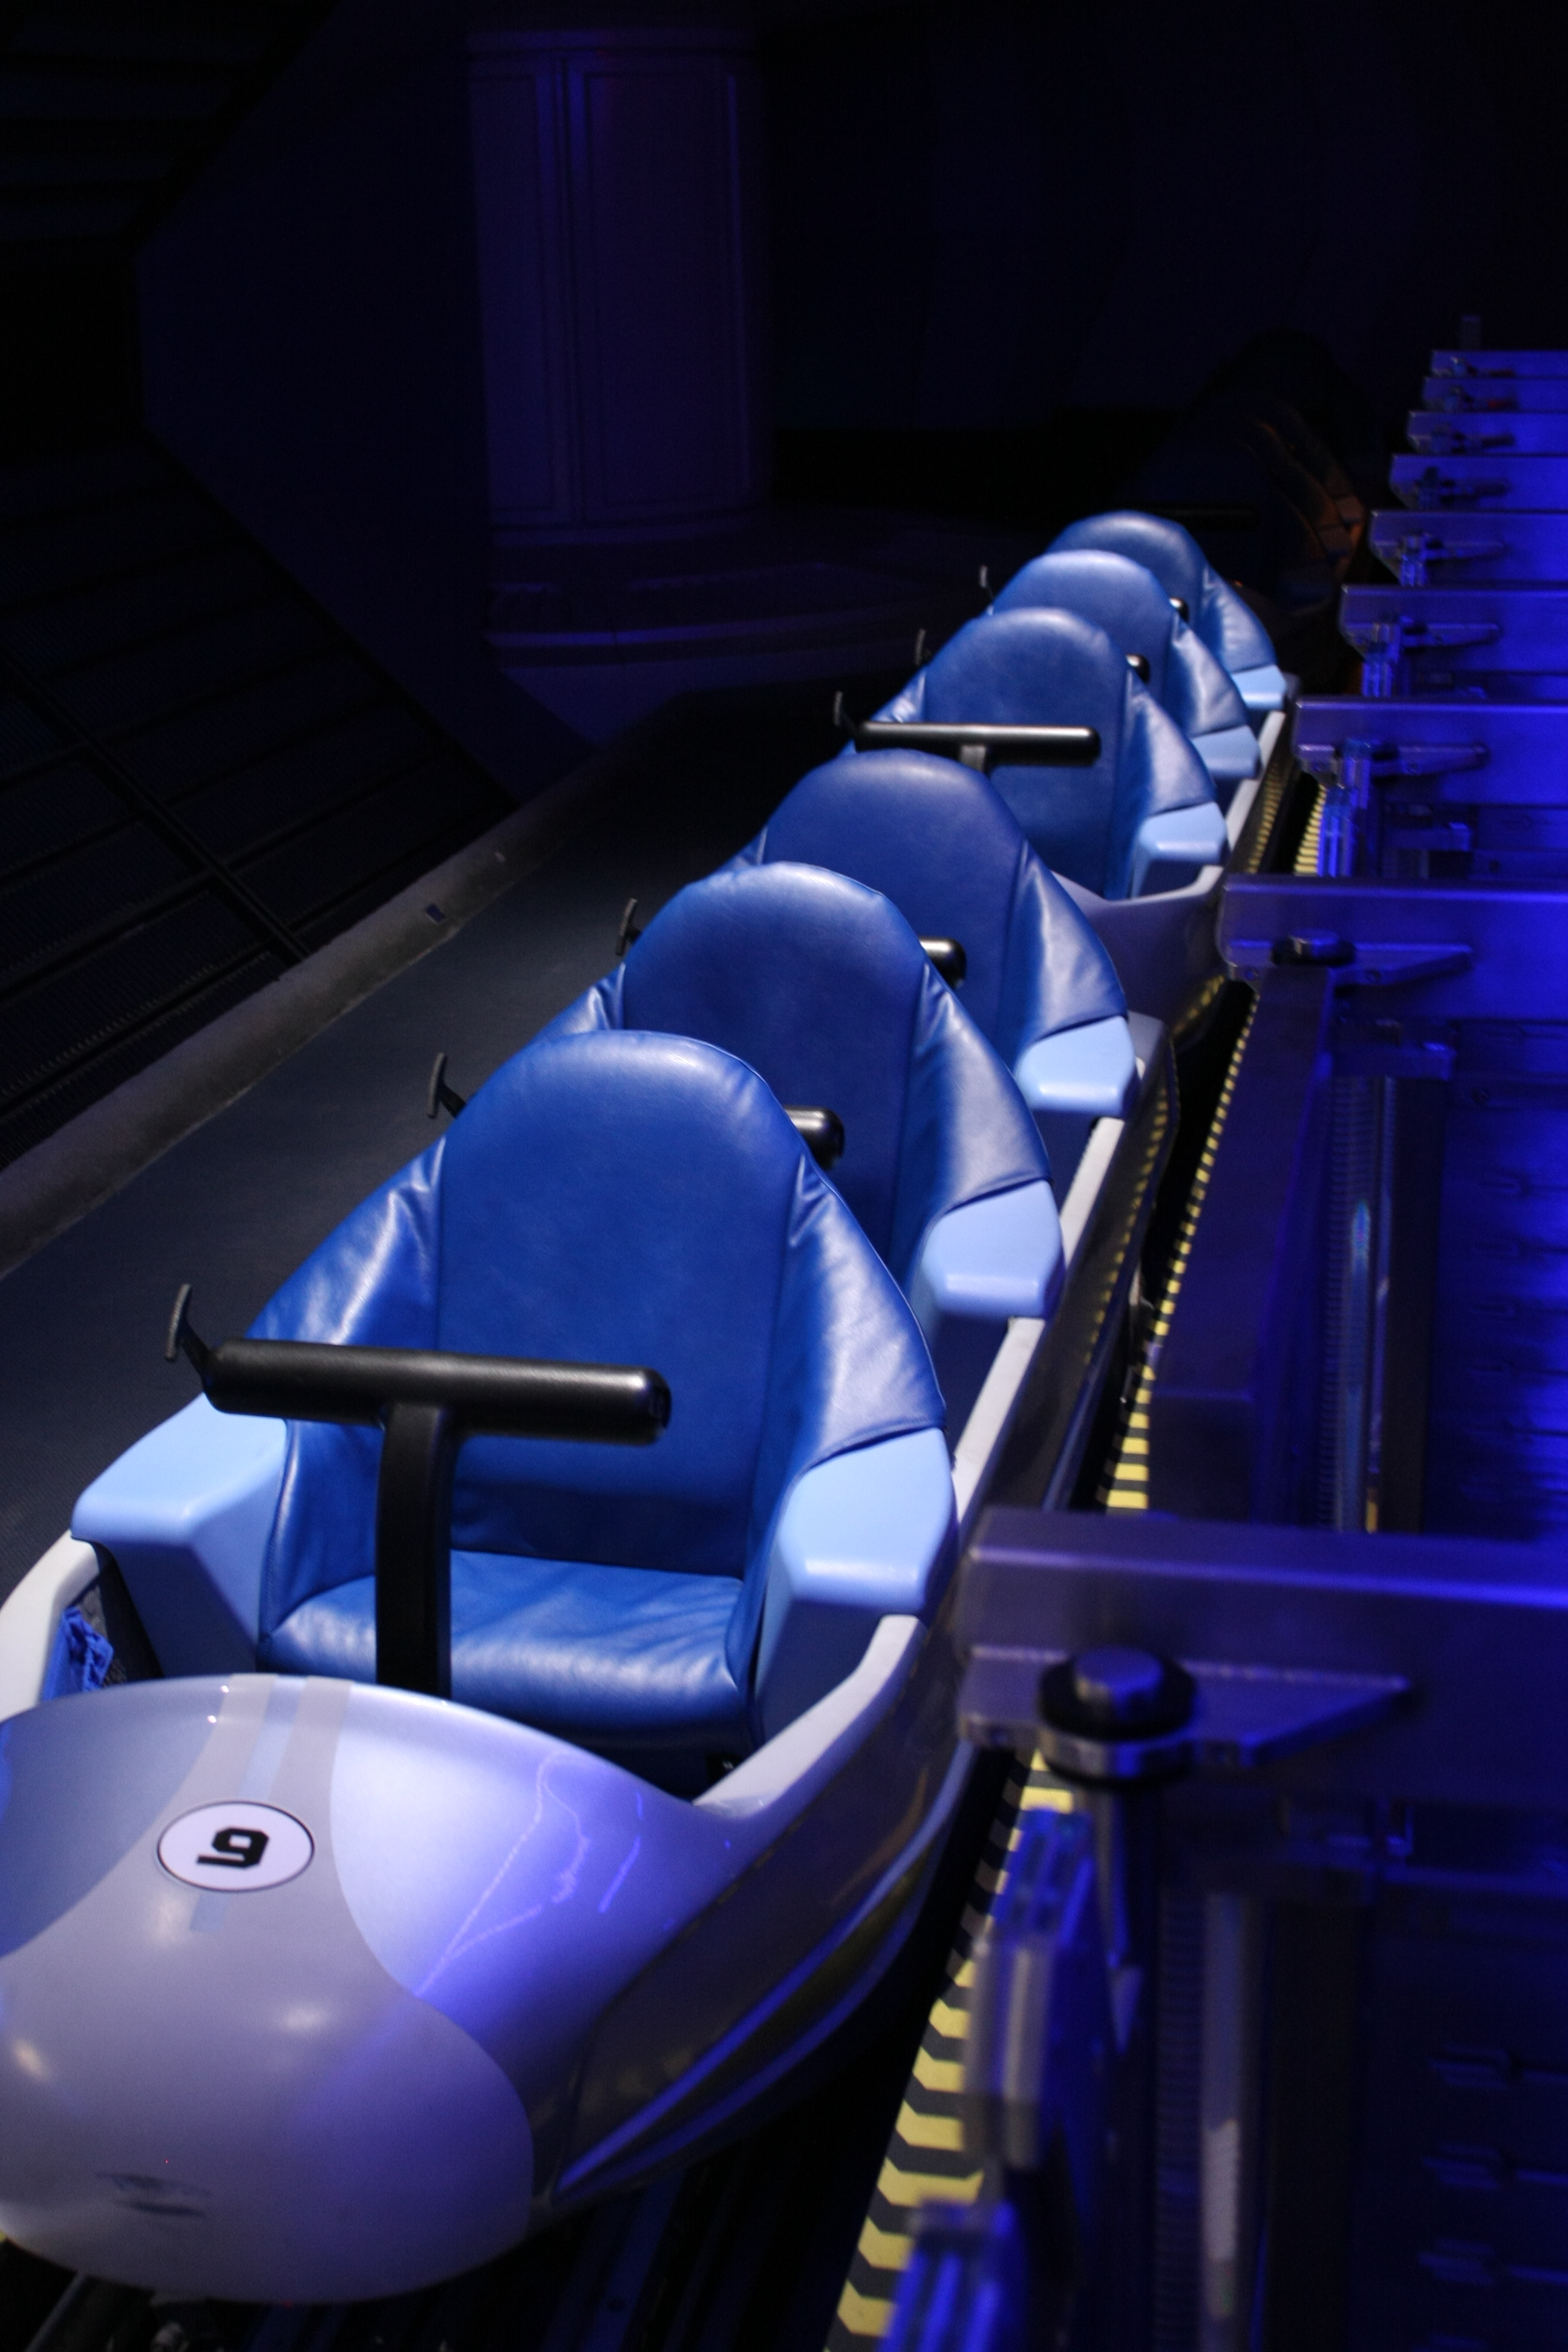 Free Car Seats In Orlando Florida